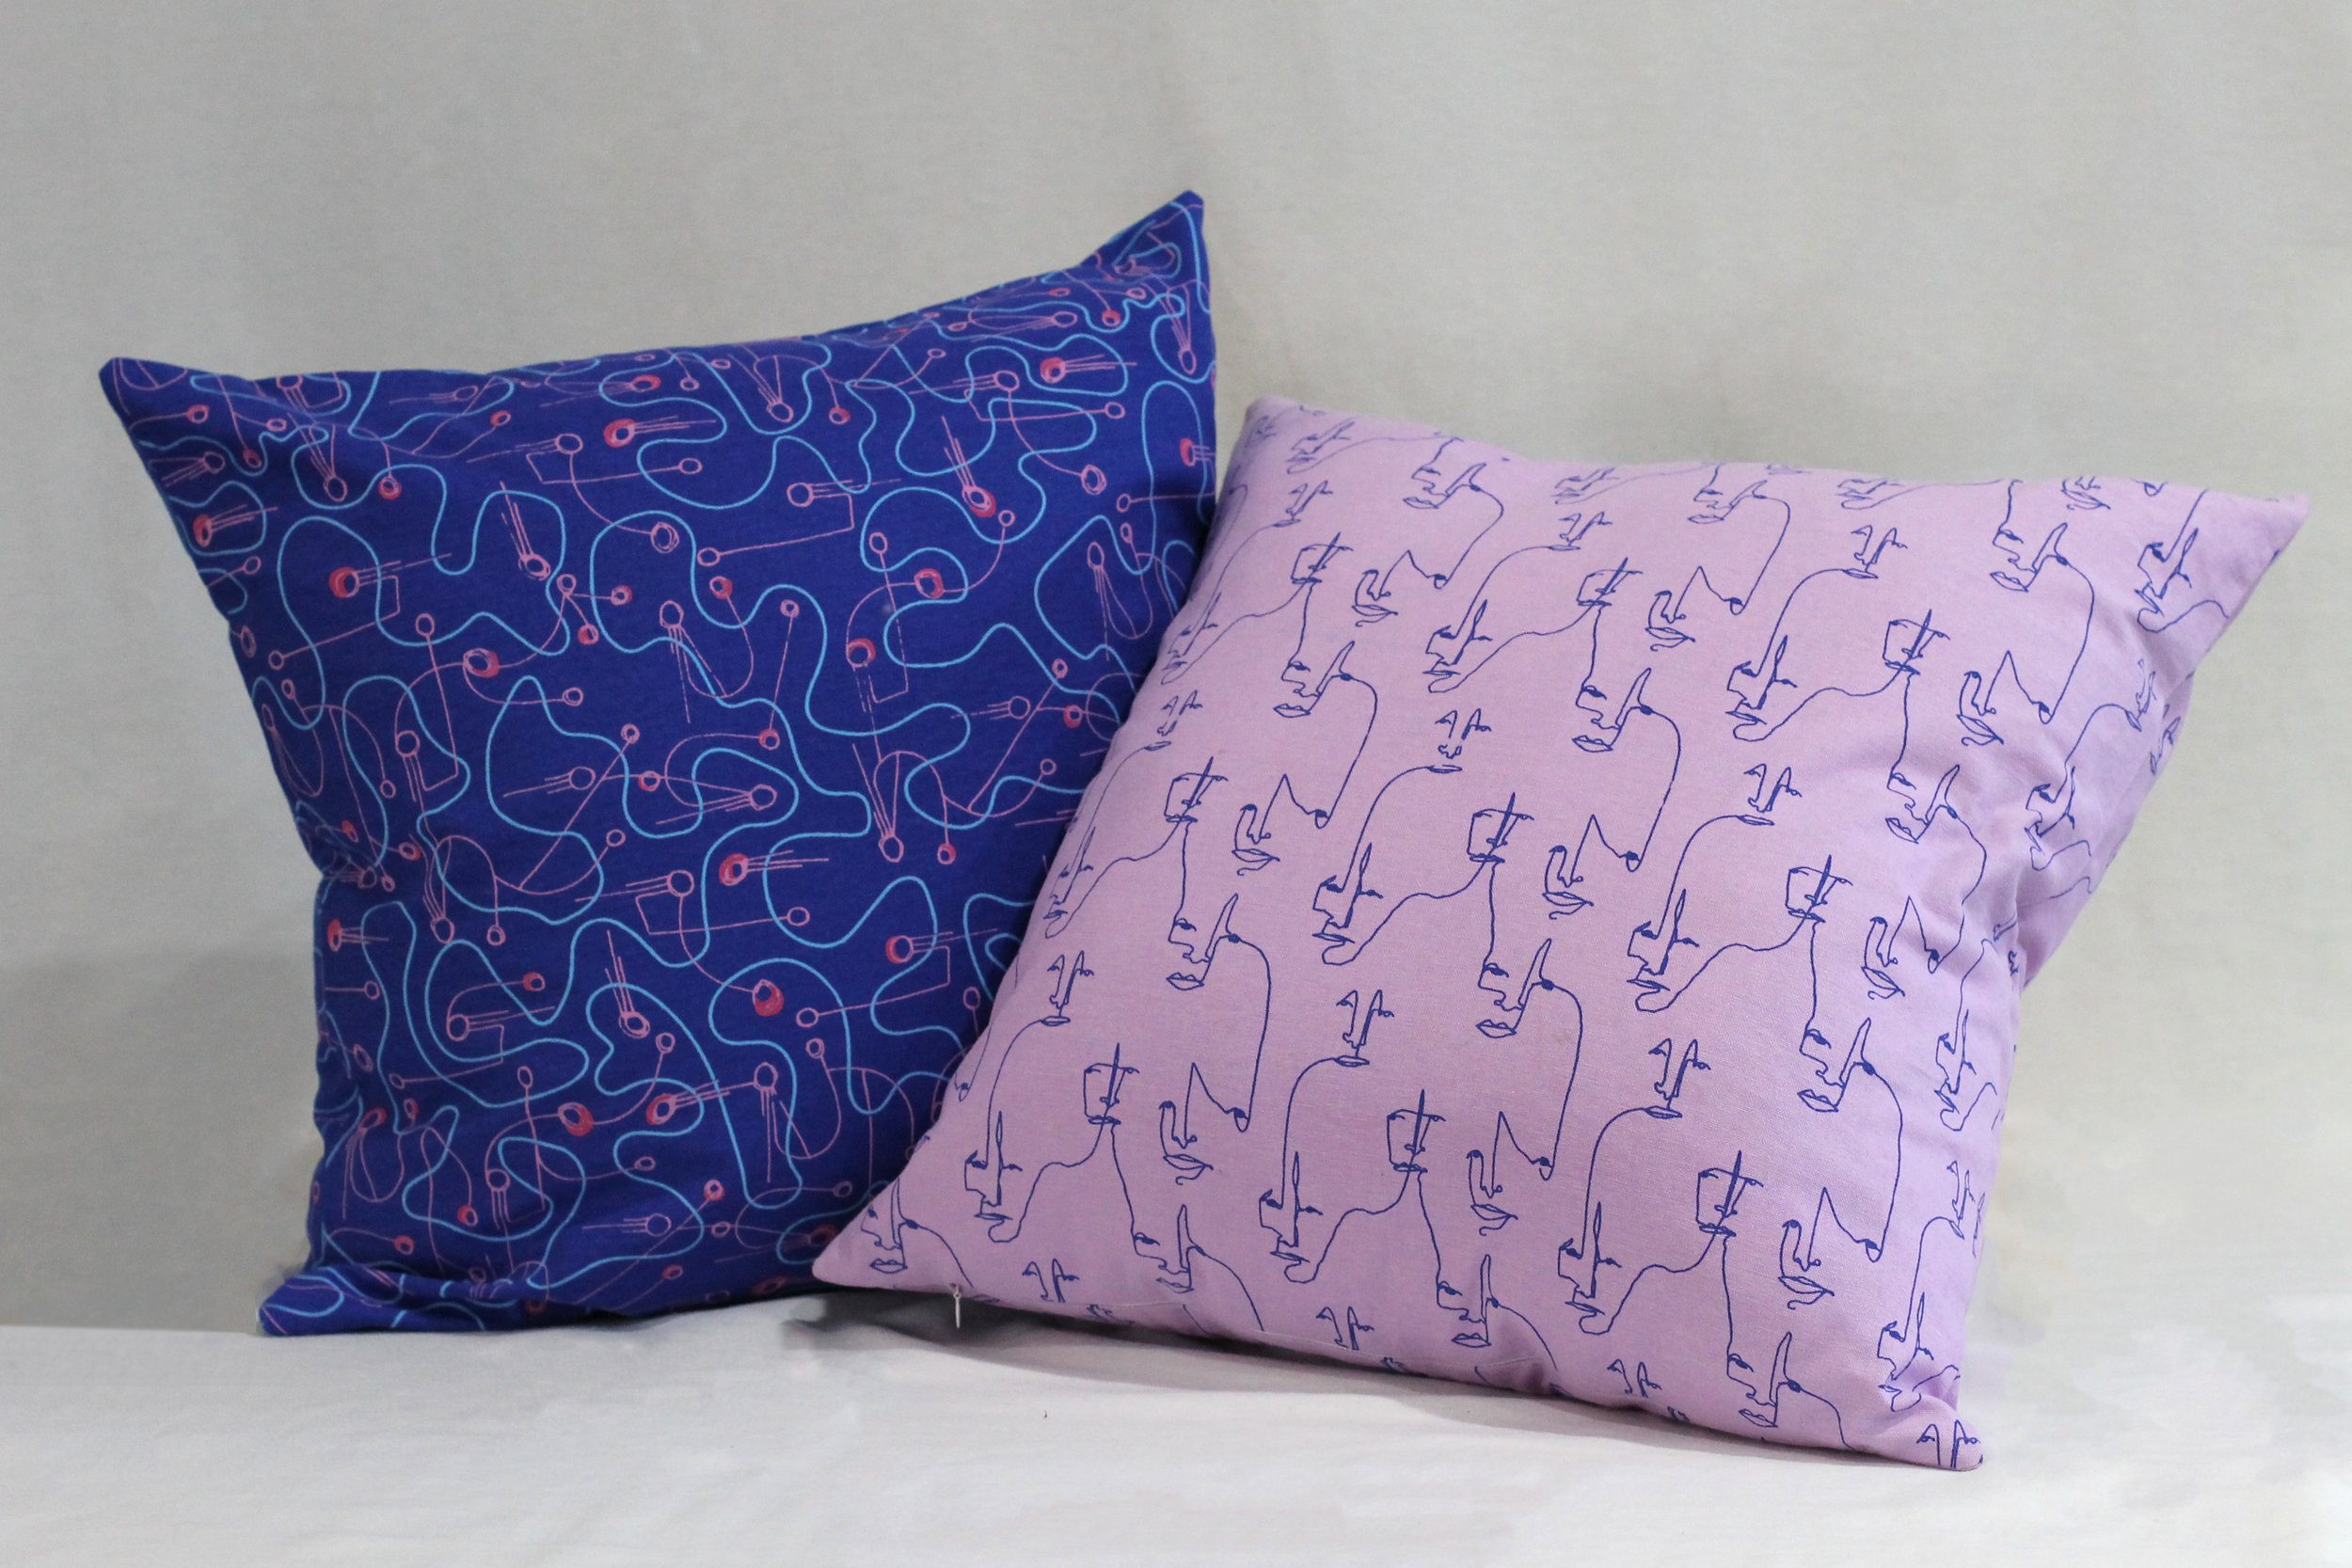 FLIGHTFACES pillow pair.jpg